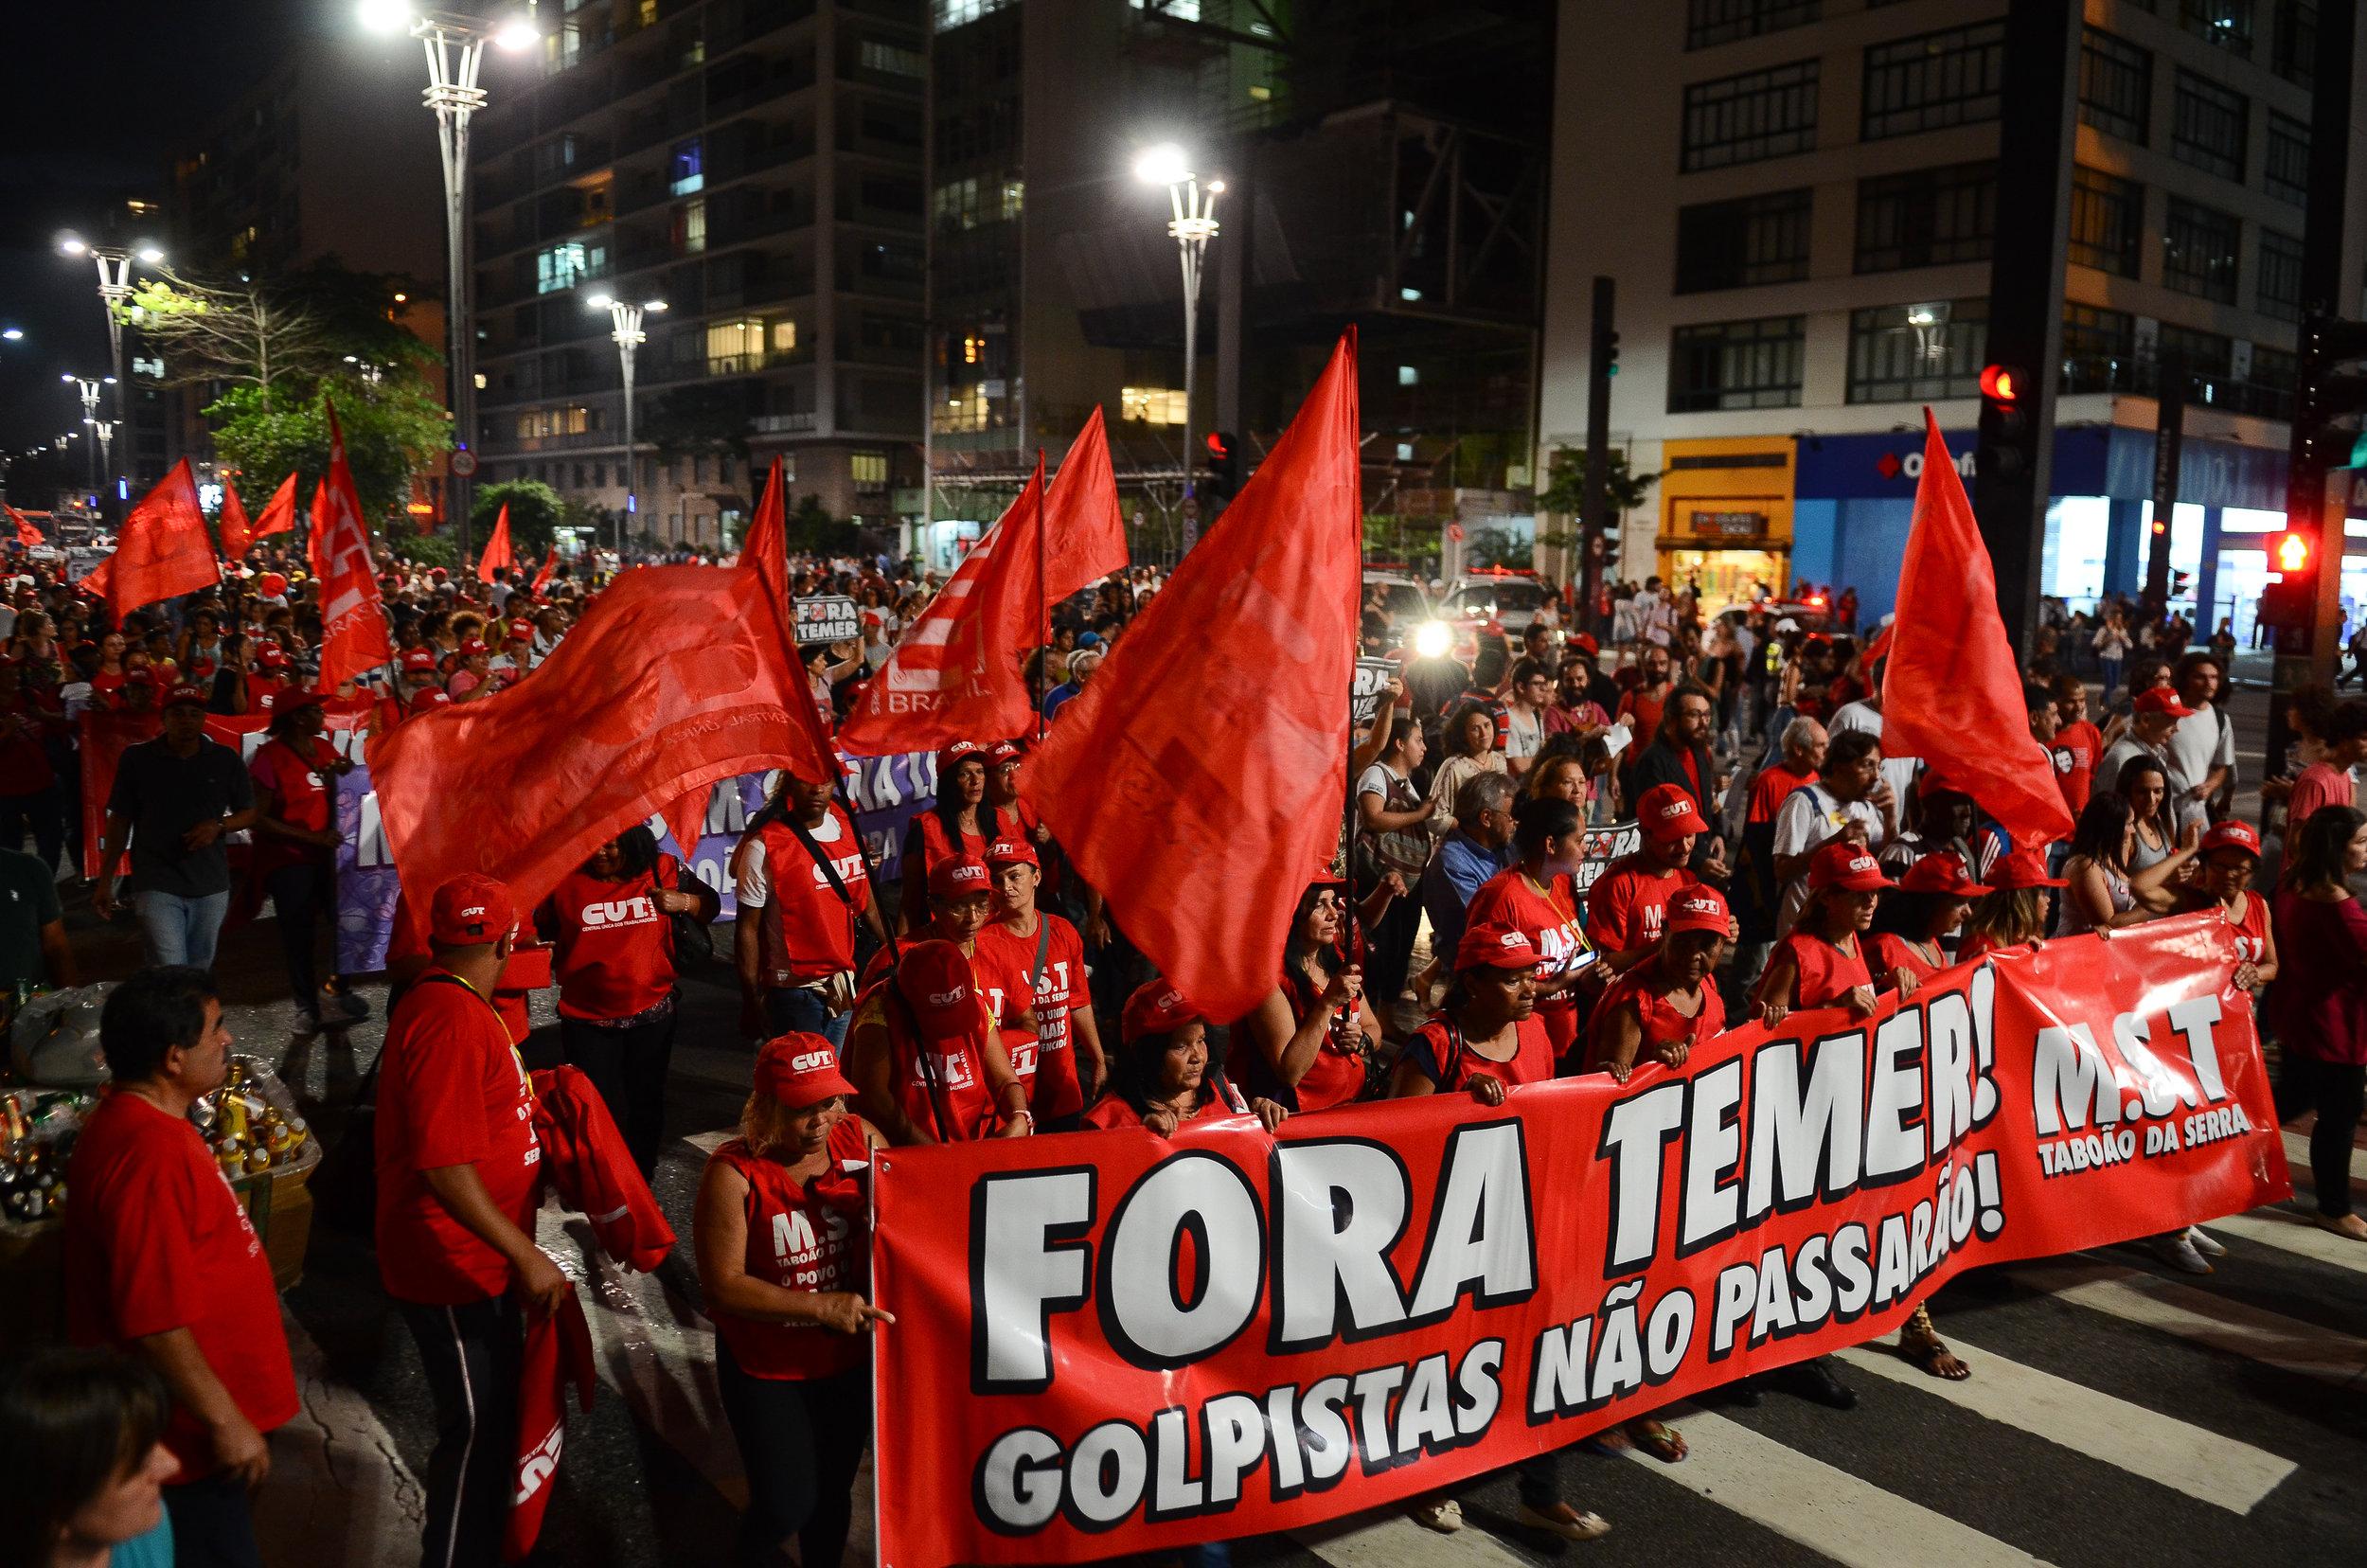 Protest against President Michel Temer